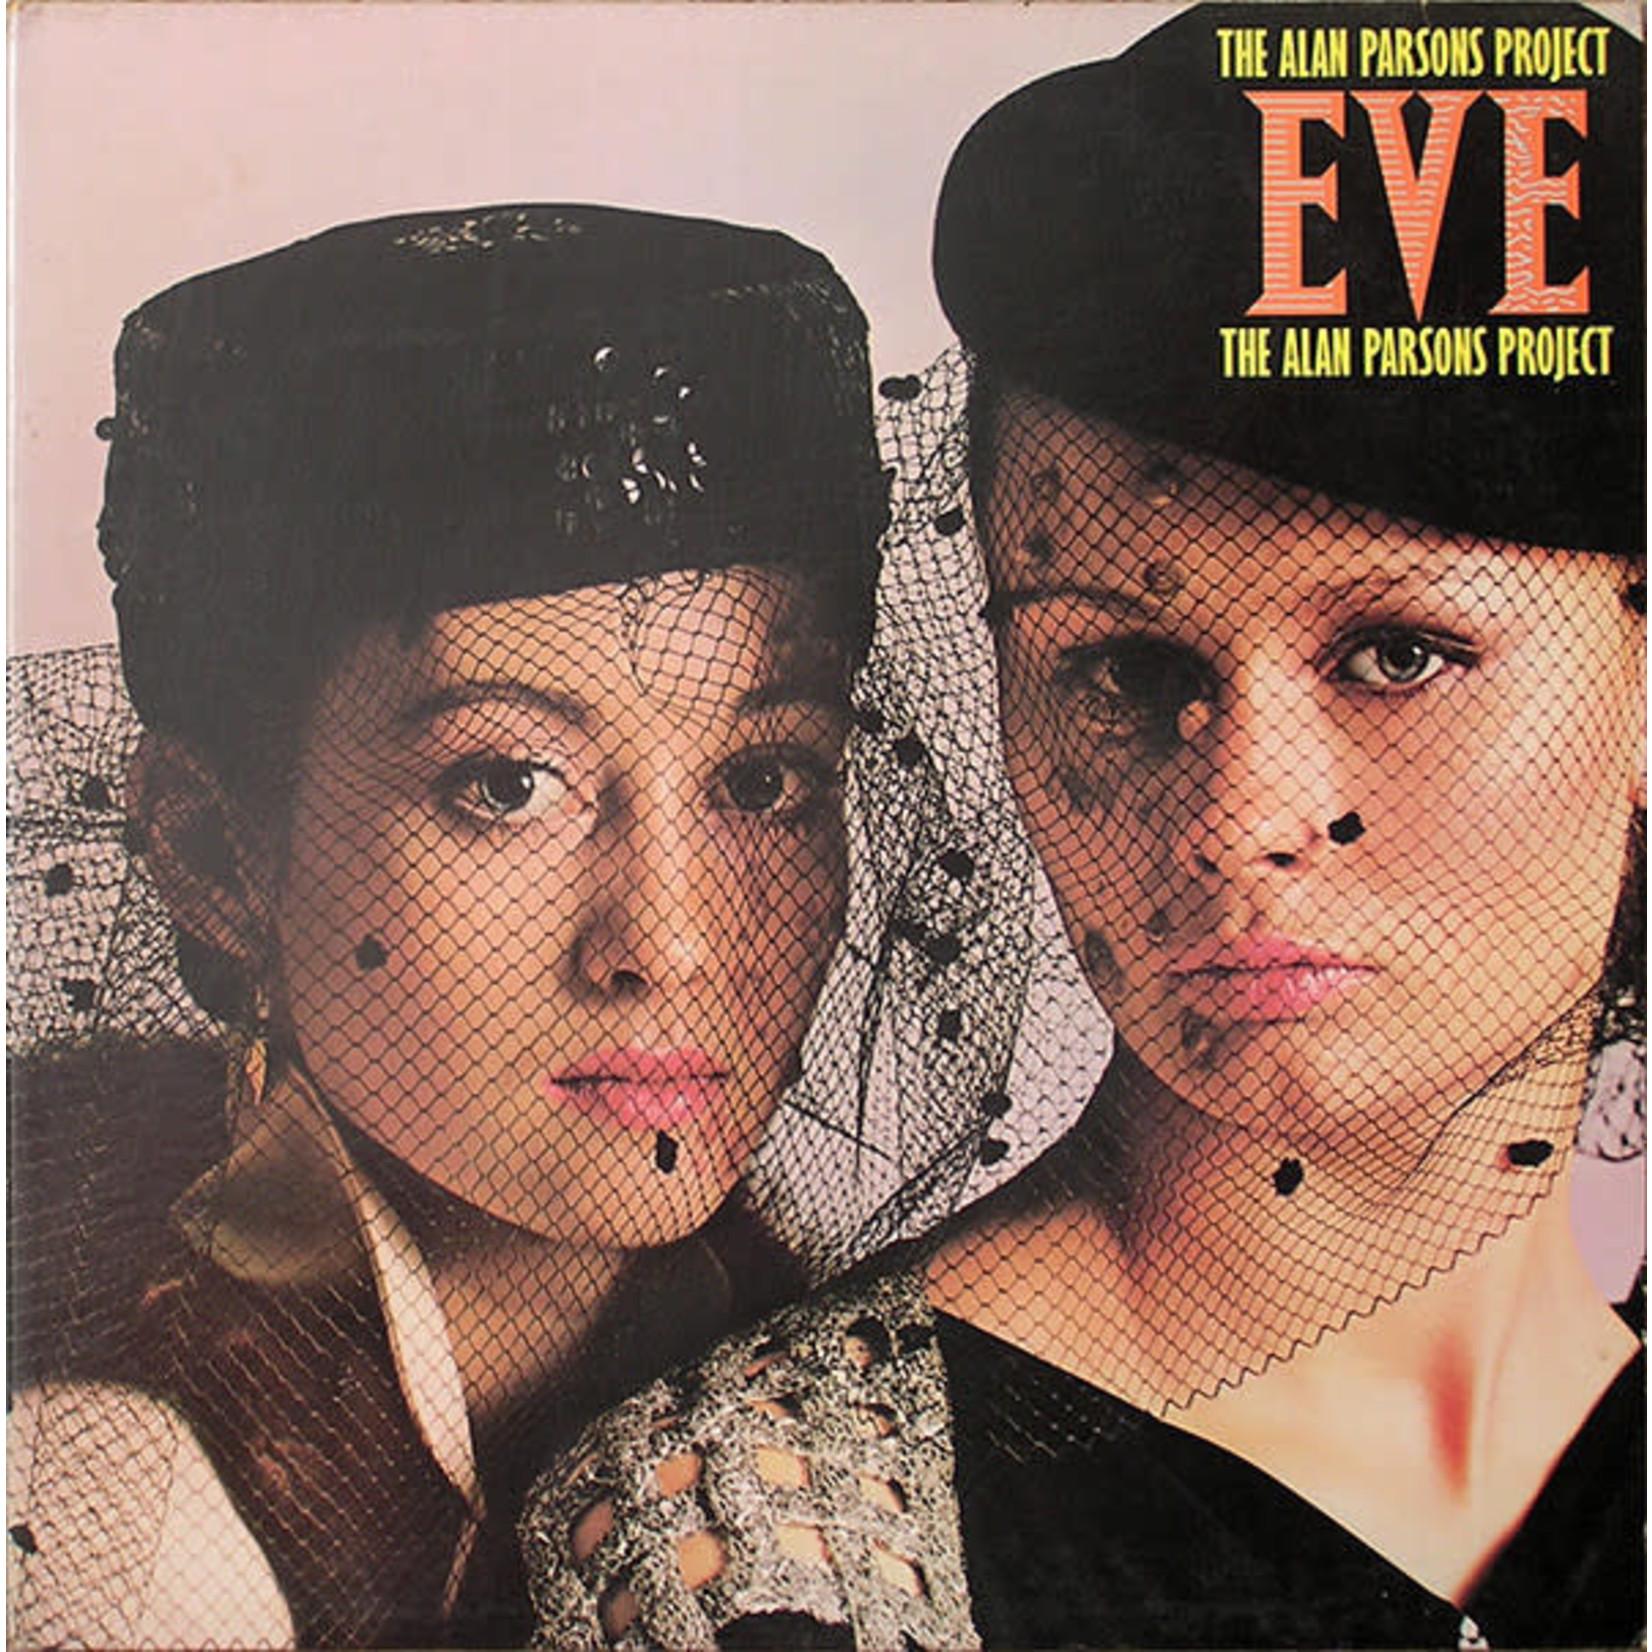 [Vintage] Parsons, Alan: Eve